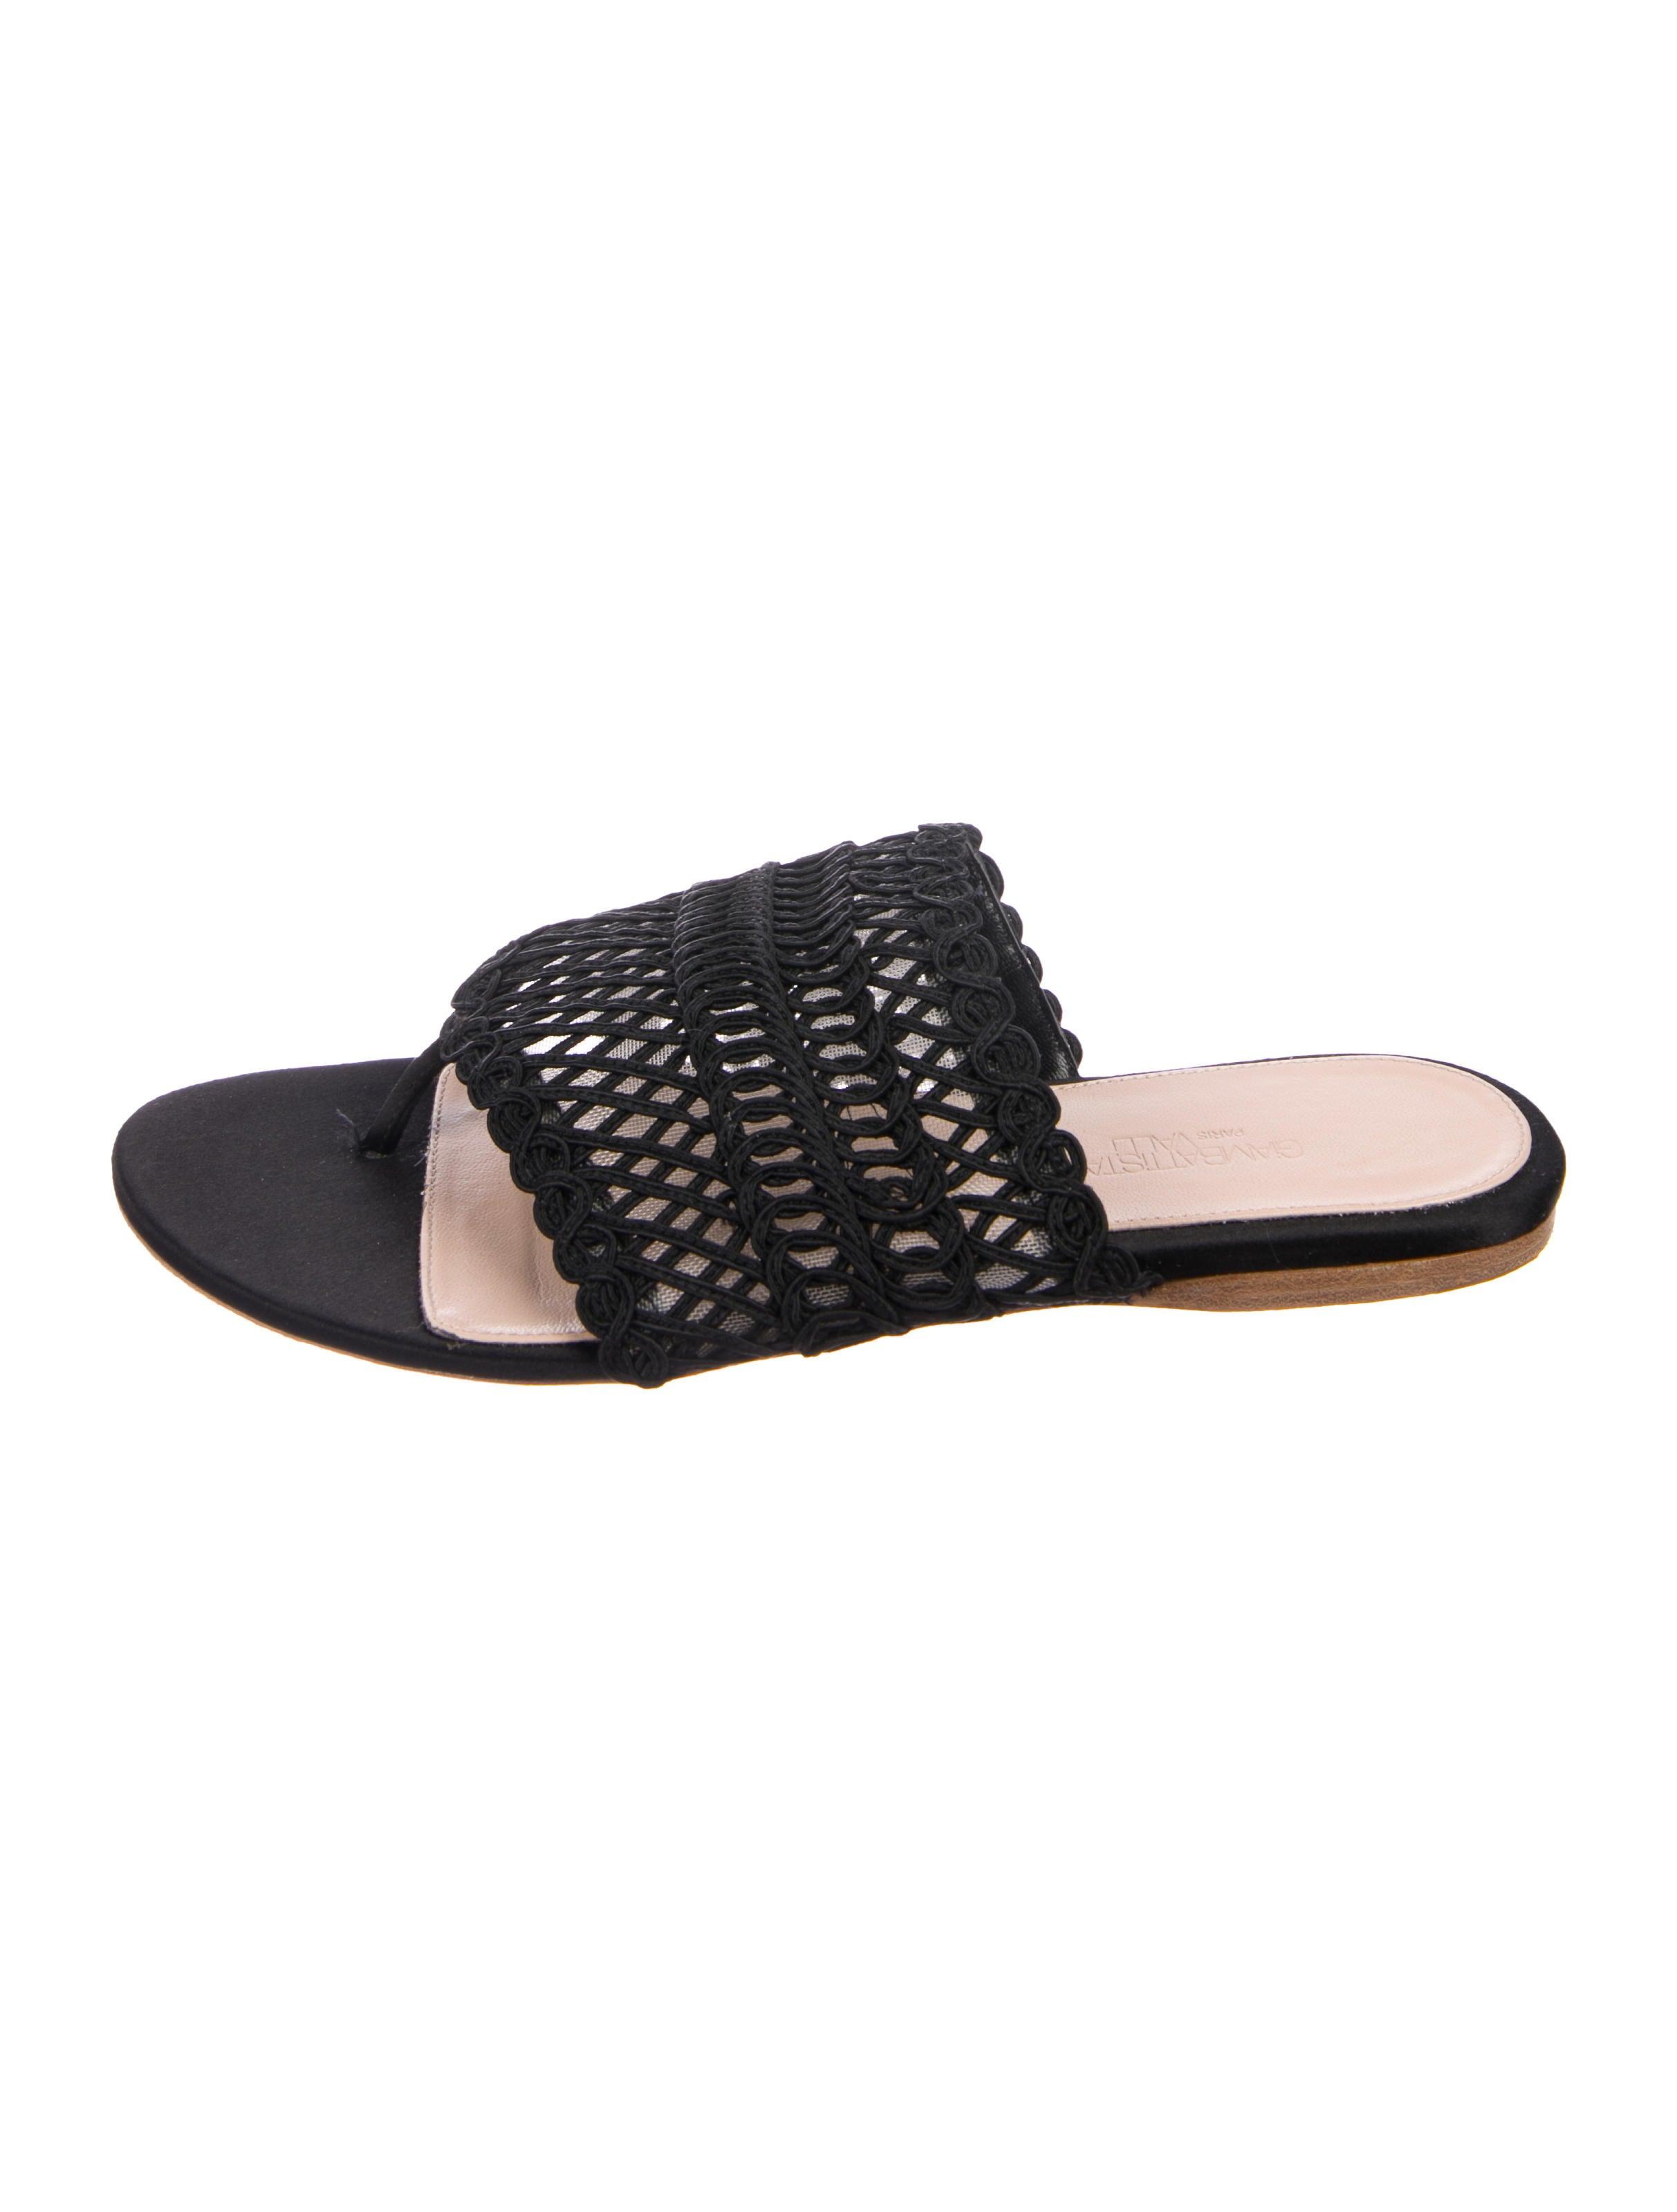 Giambattista Valli Gimp Thong Sandals best place cheap price ILKkU3